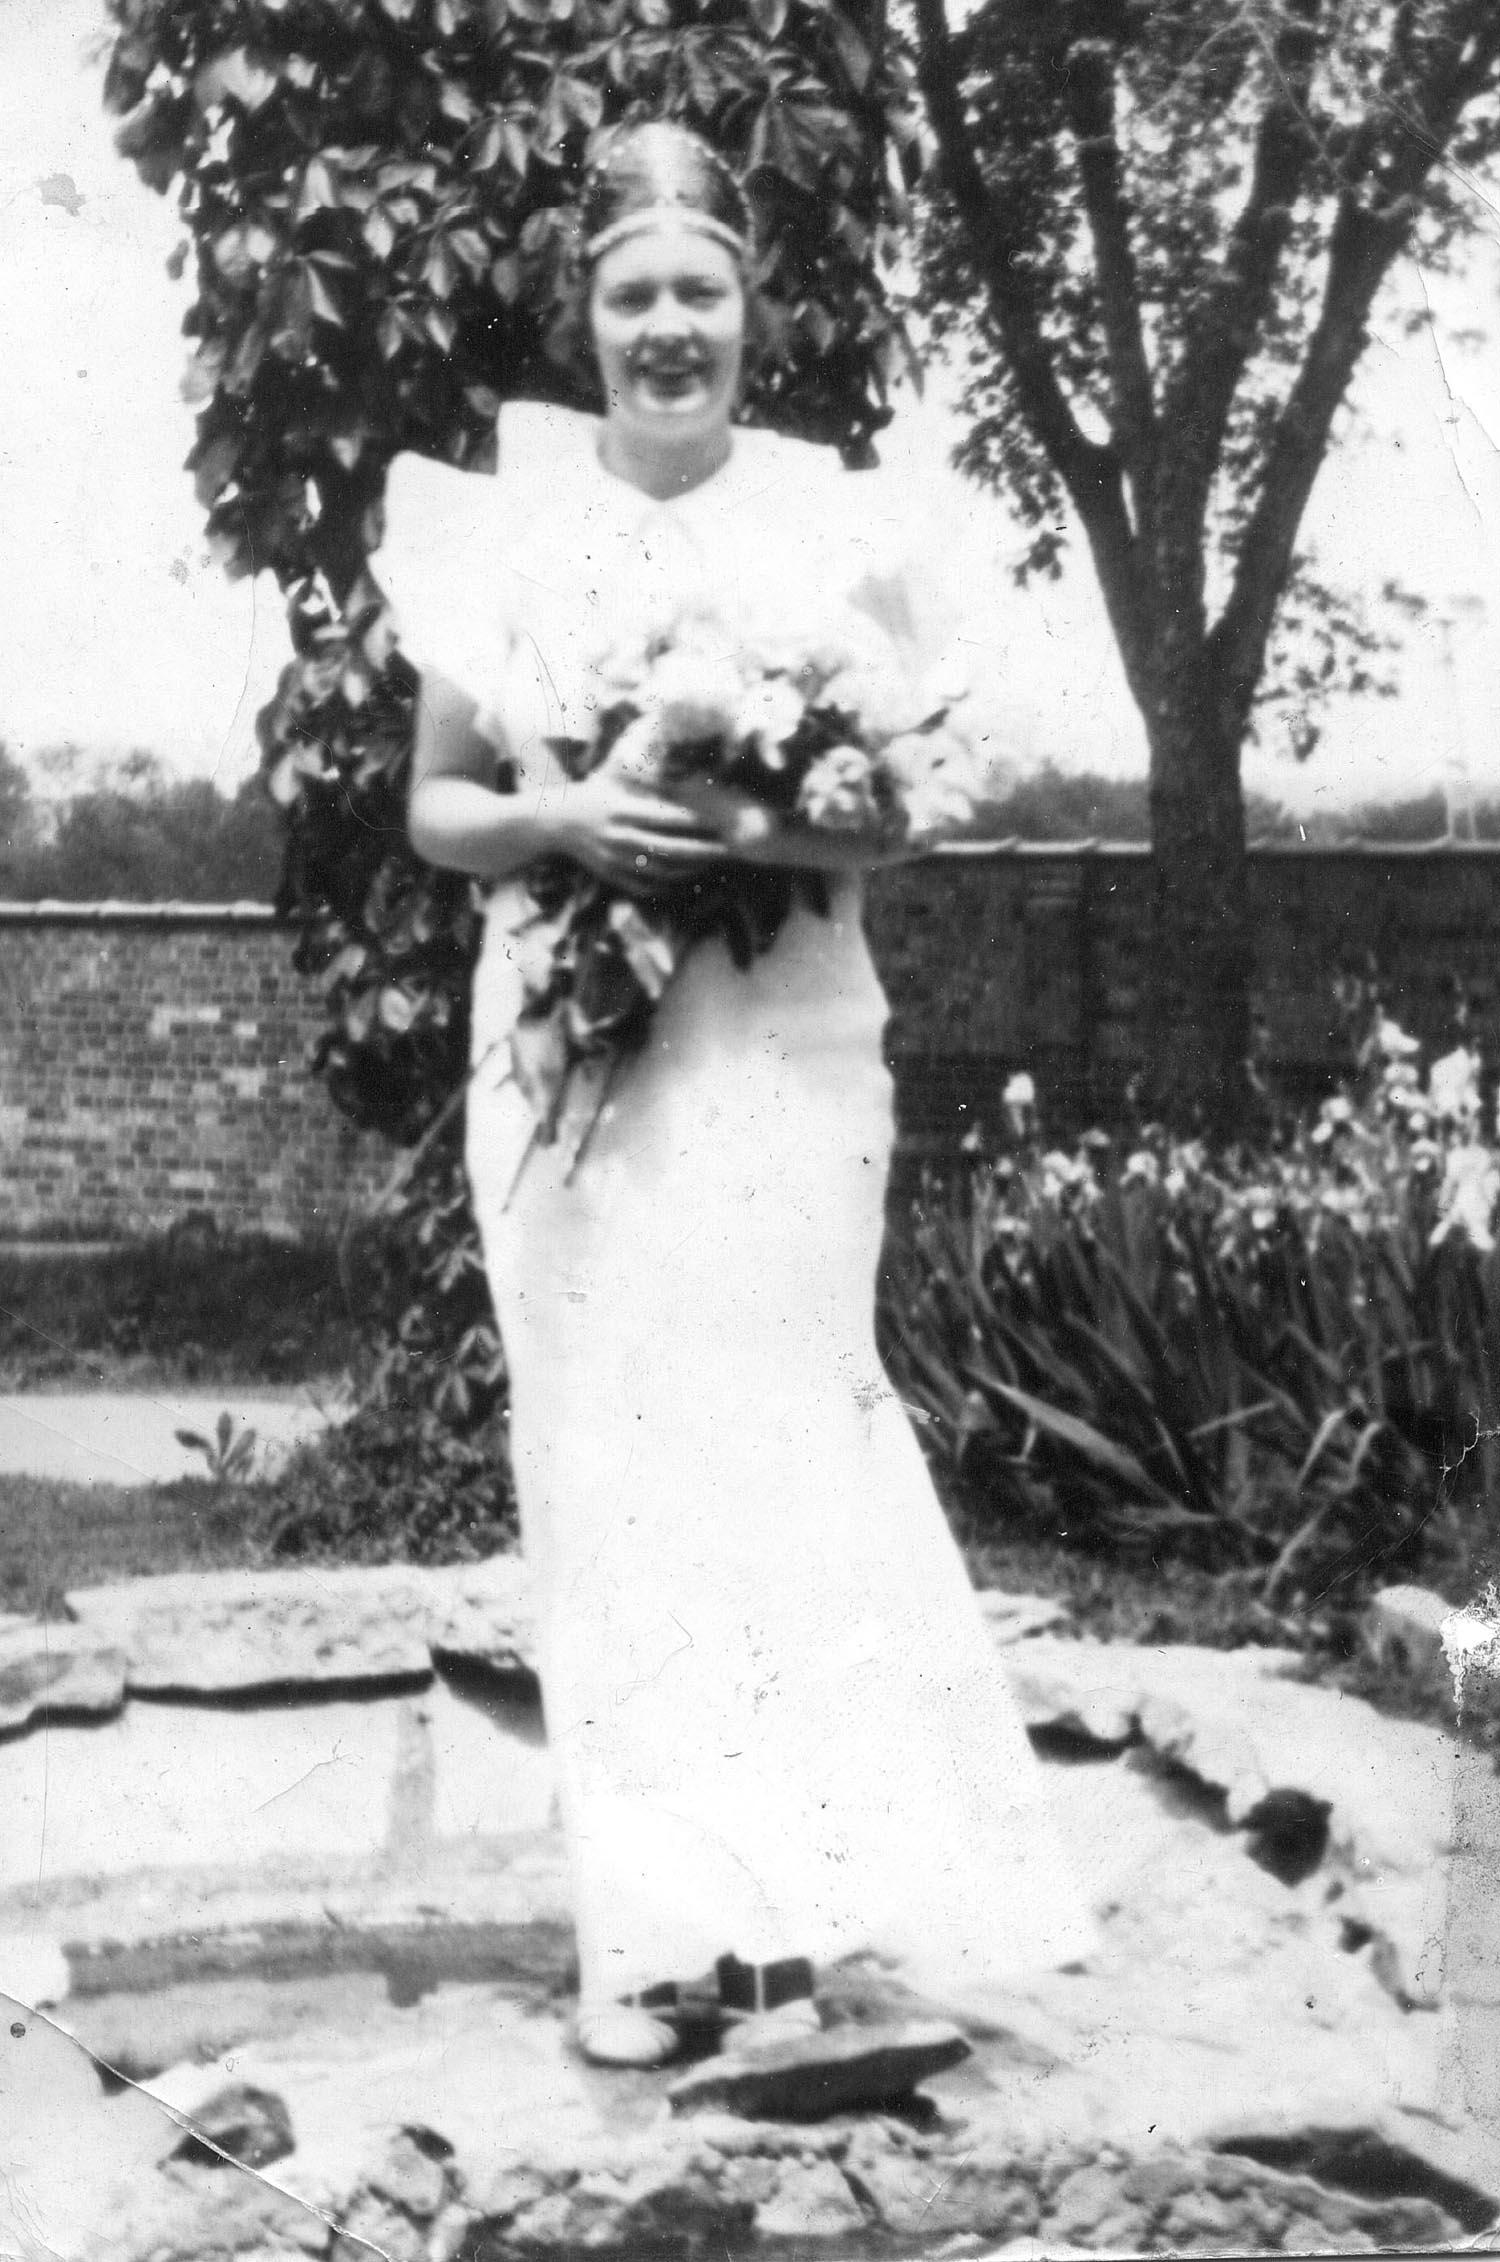 Isabel Wattles as May Queen, McKendree College, 1936